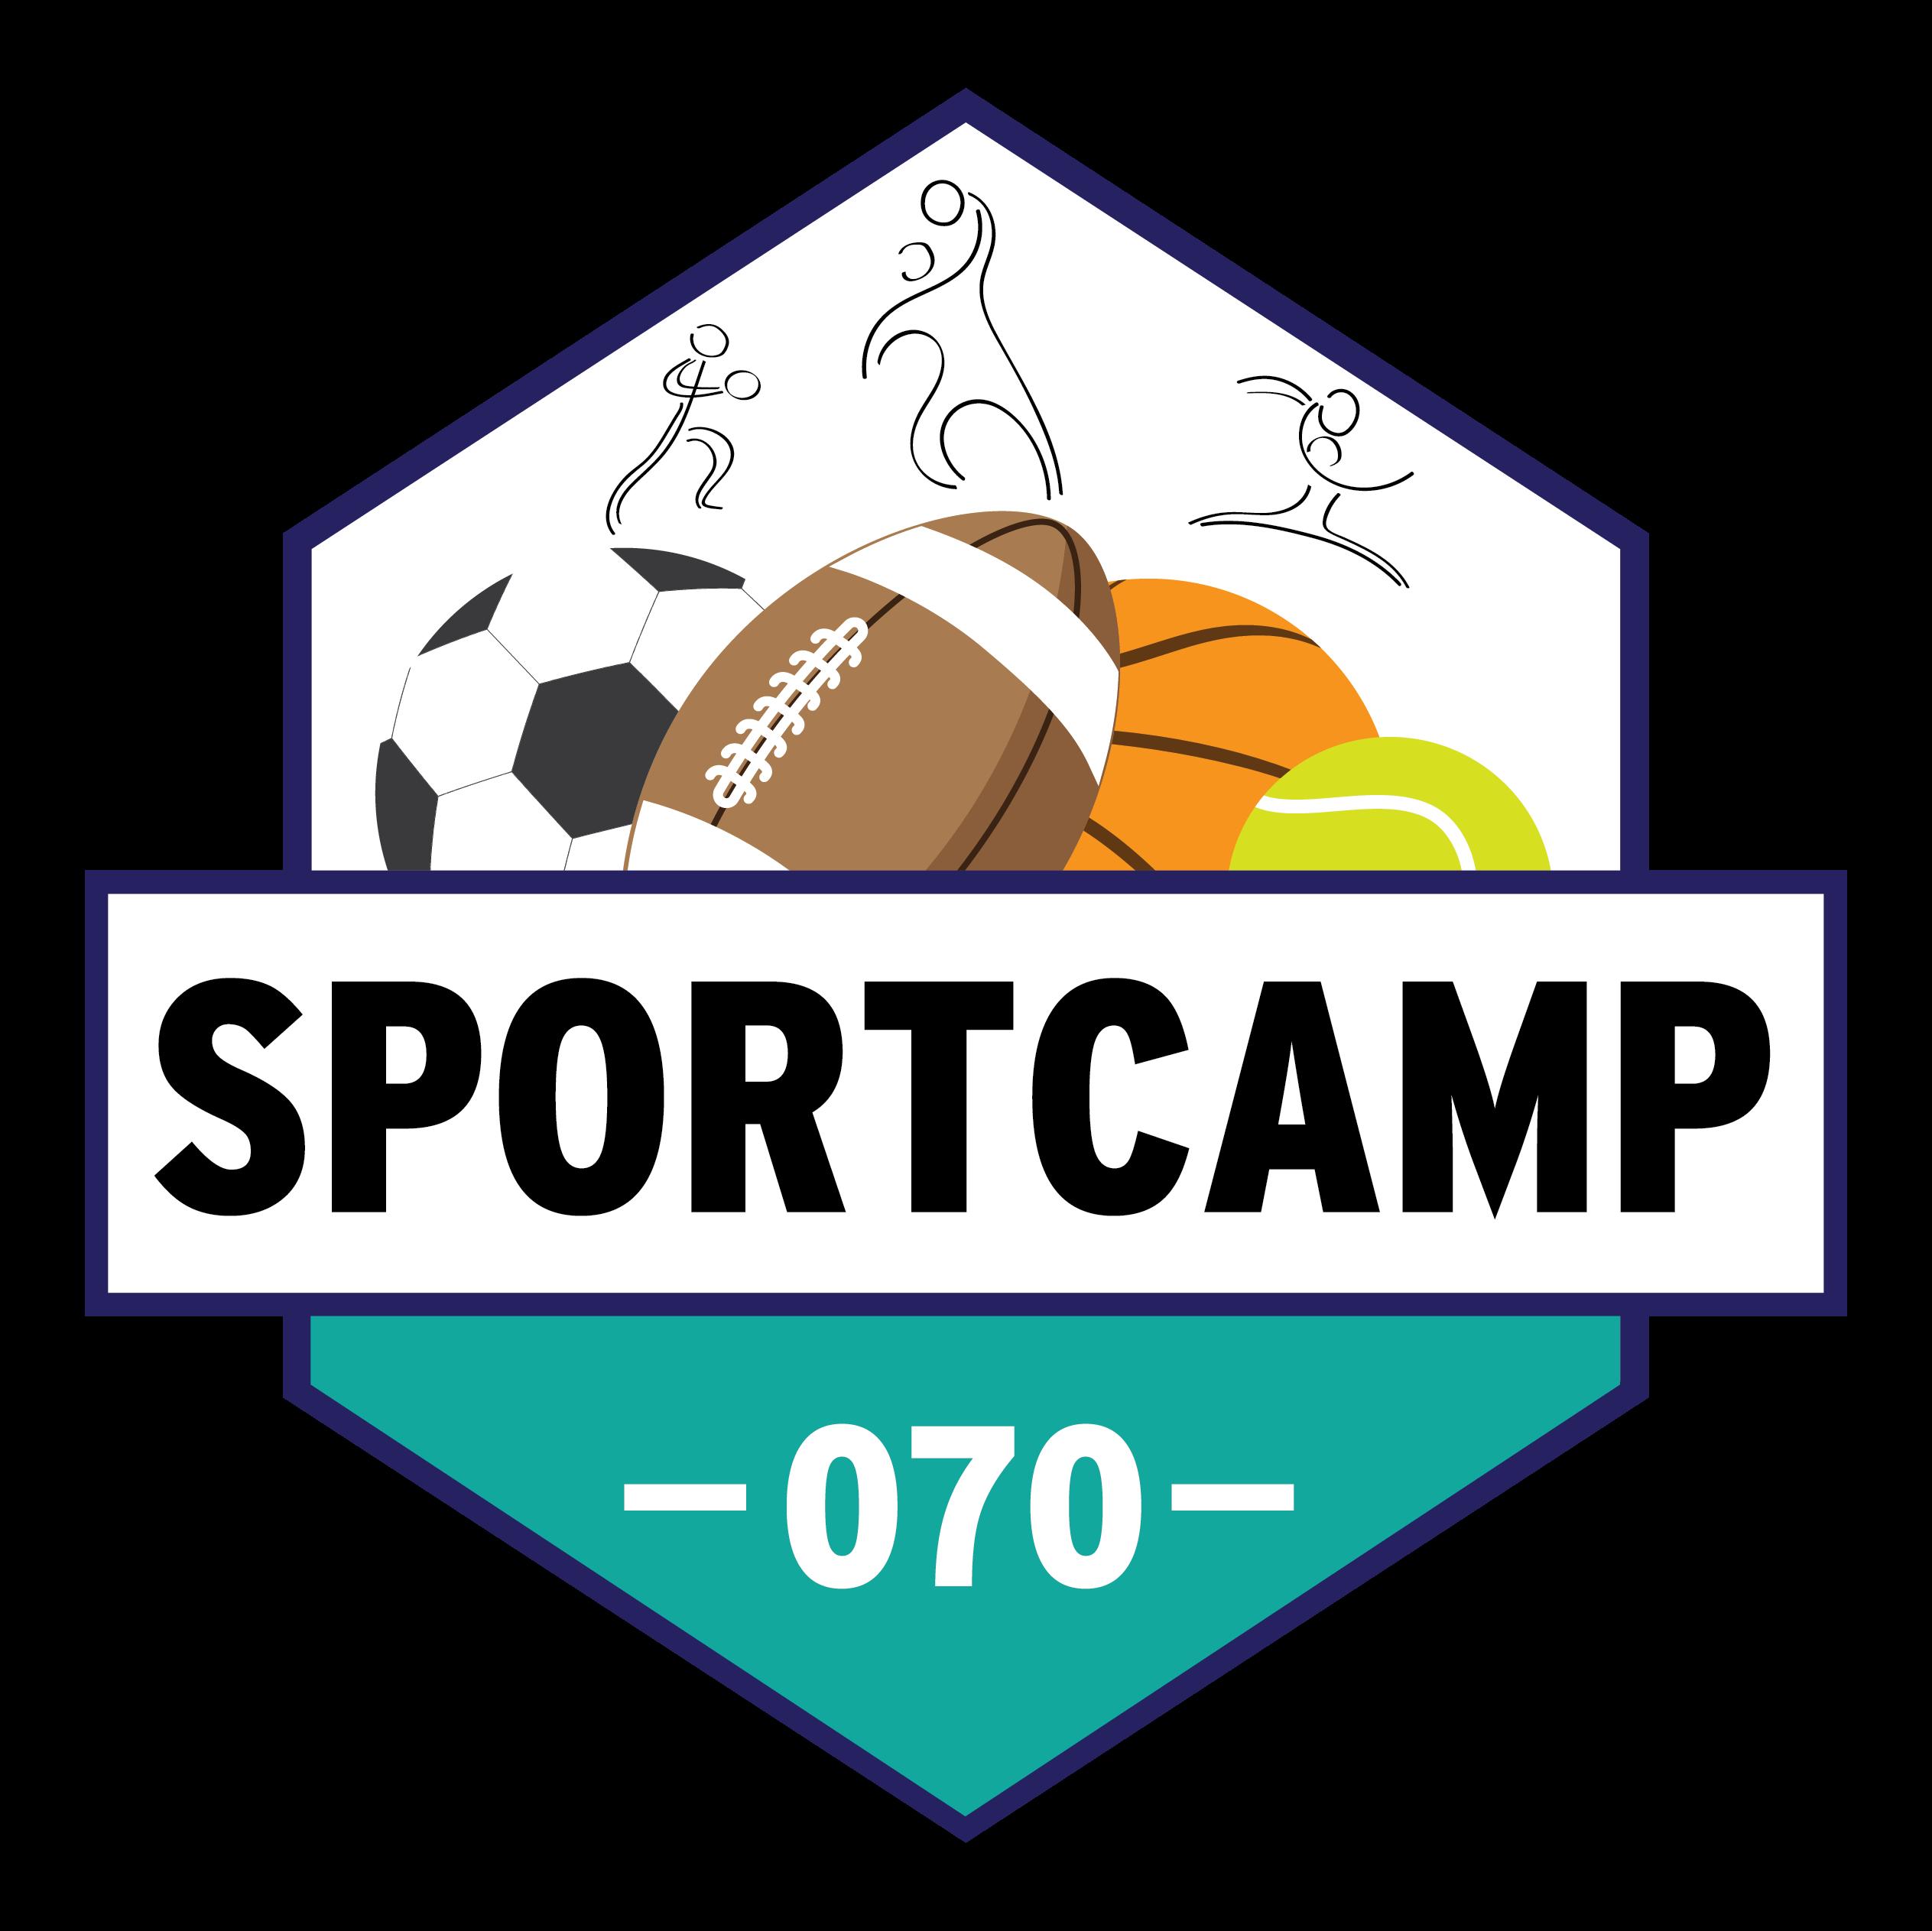 Sportcamp070